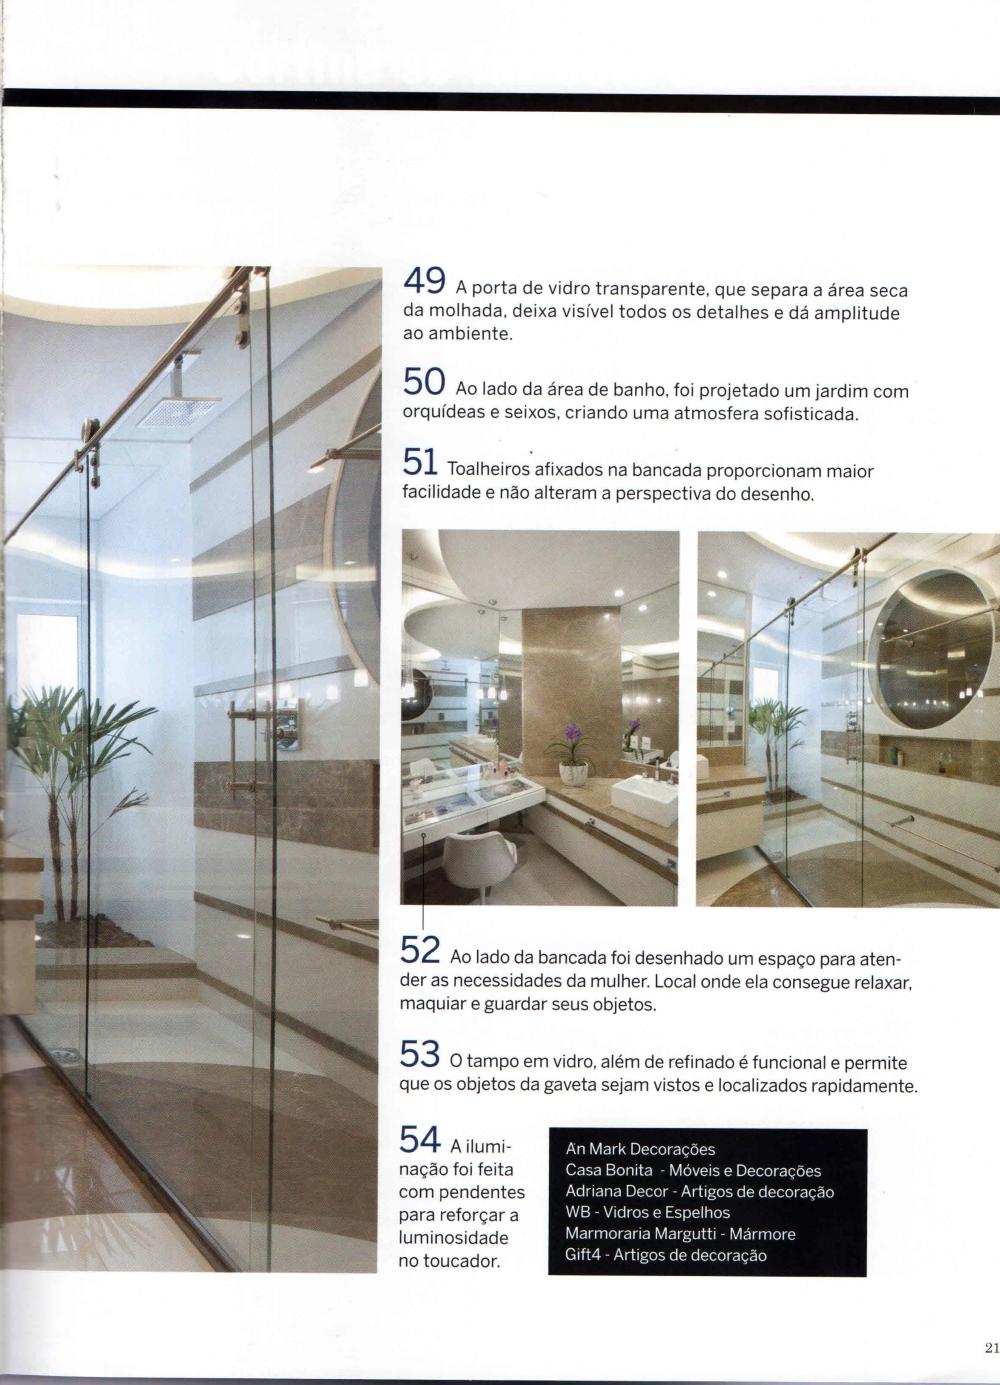 Arquiteto Aquiles Nicolas Kilaris Revista Guia 1001 ideias (3)